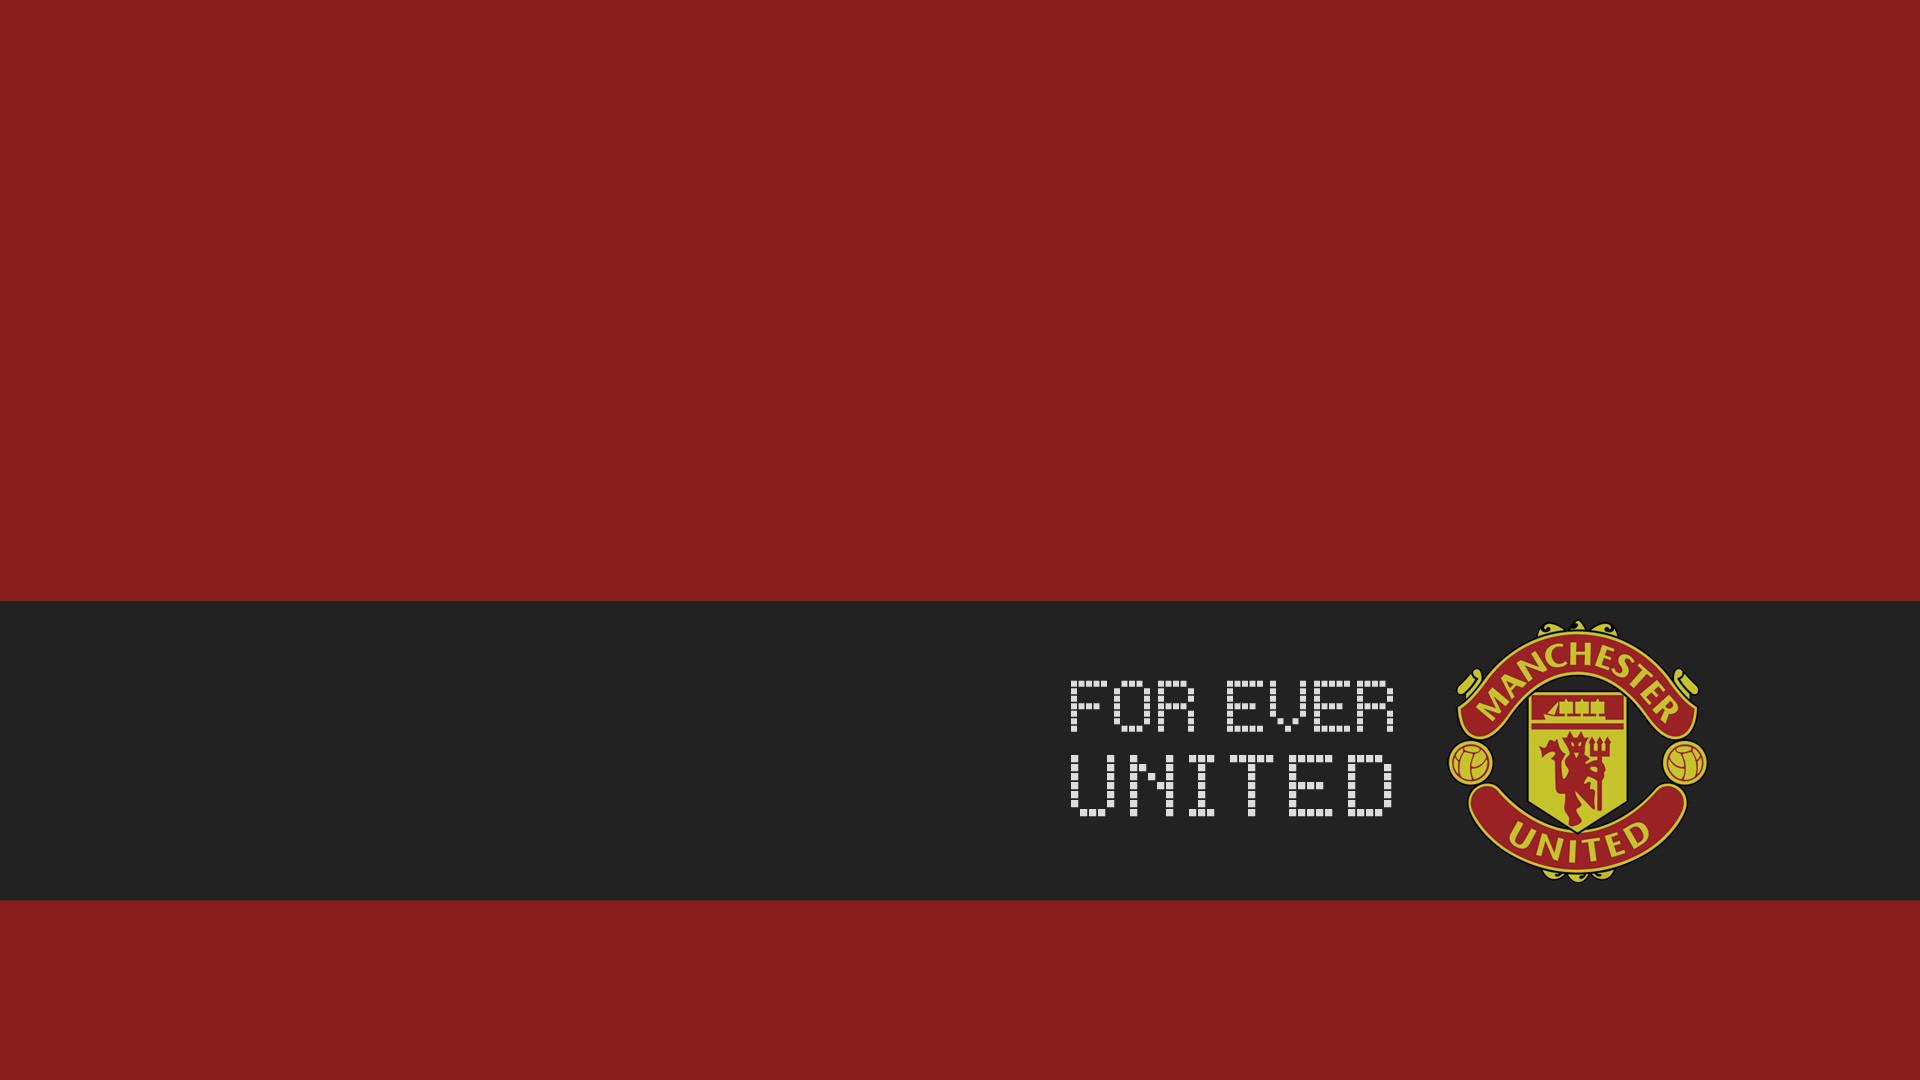 Man United Wallpapers Wallpaper | HD Wallpapers | Pinterest | Manchester,  Wallpaper and Hd wallpaper